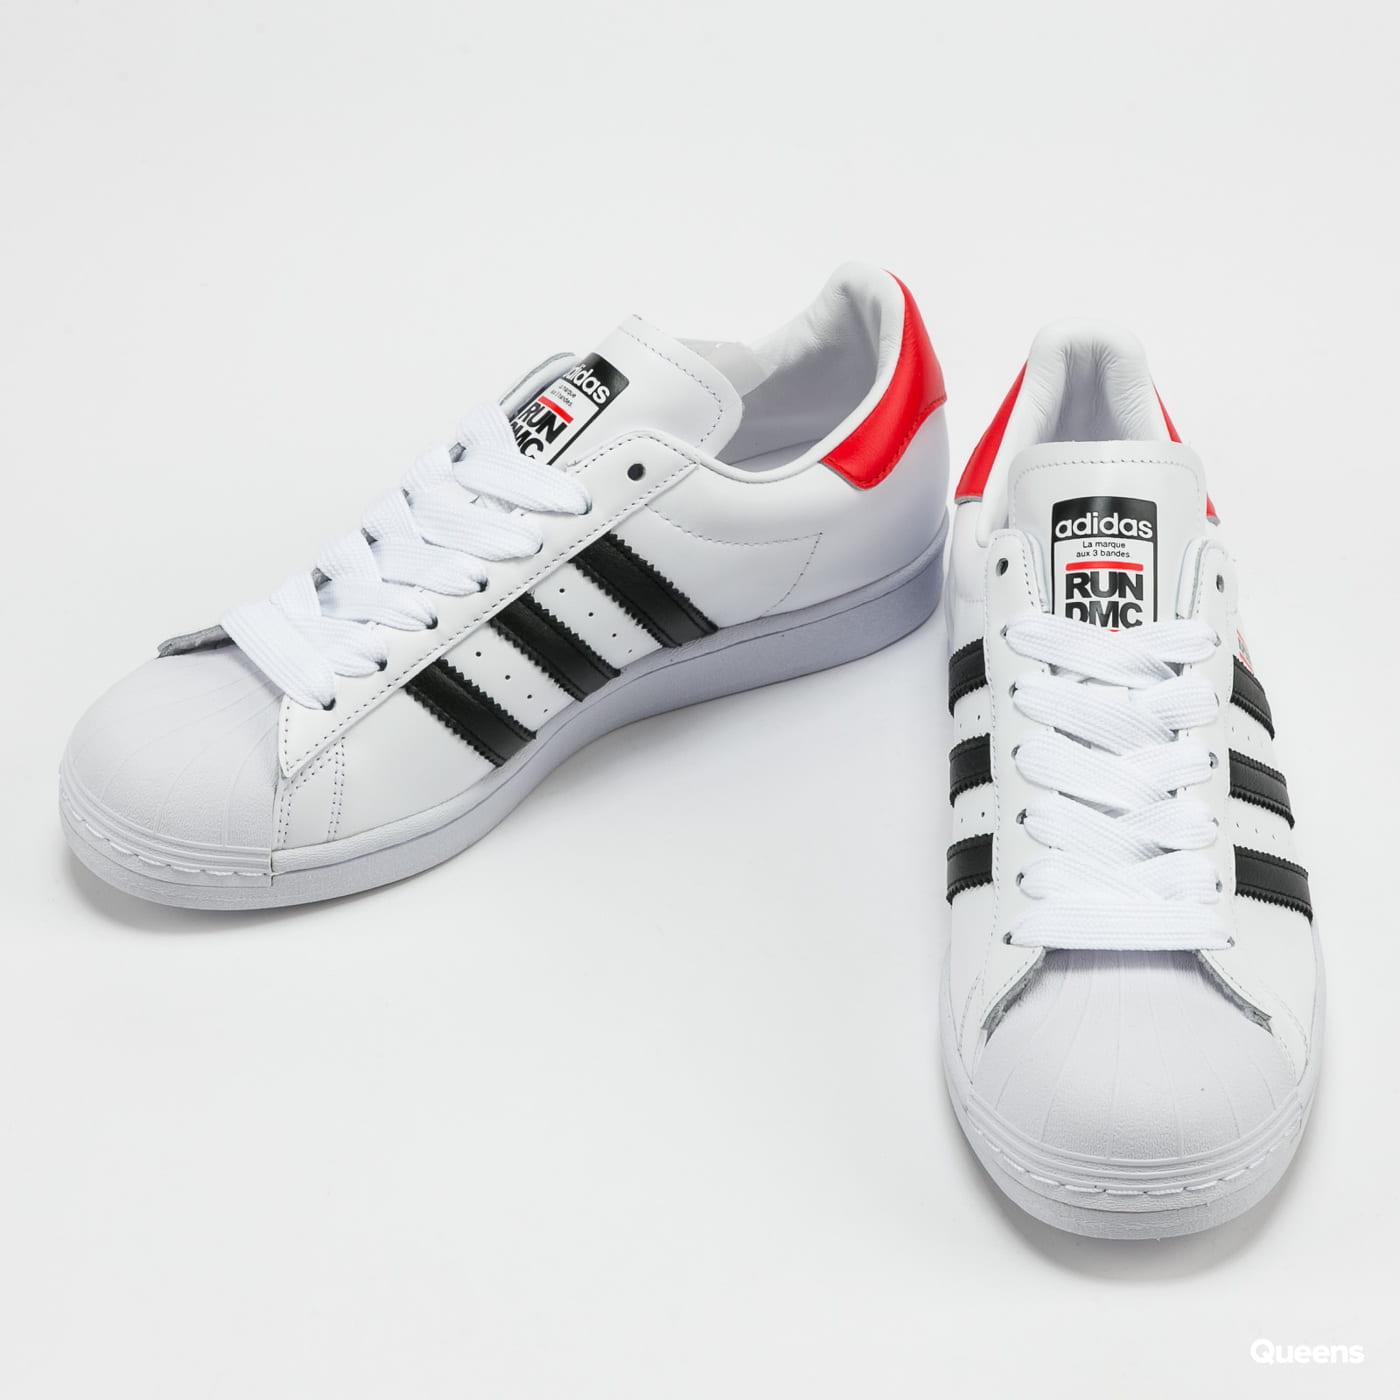 adidas Originals Superstar 50 Run DMC ftwwht / cblack / hirere